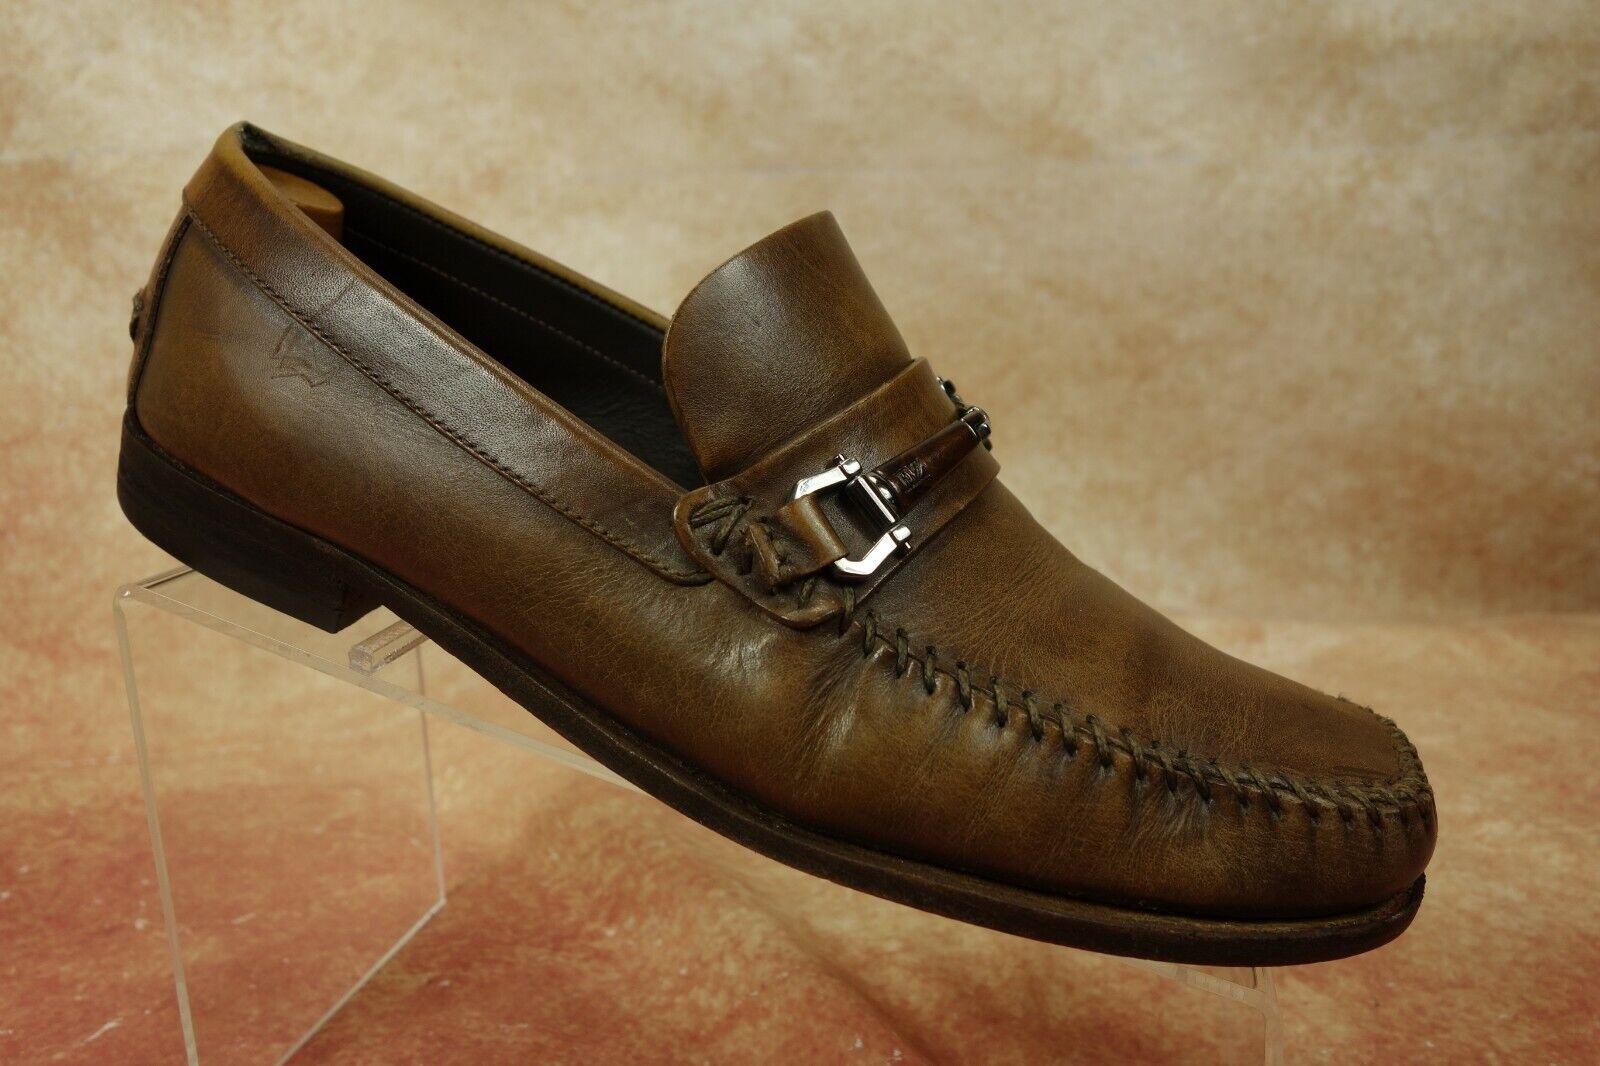 Ermenegildo Zegna Brown Leather Moc Toe Slip On Horsebit Loafers Mens Size 8.5US